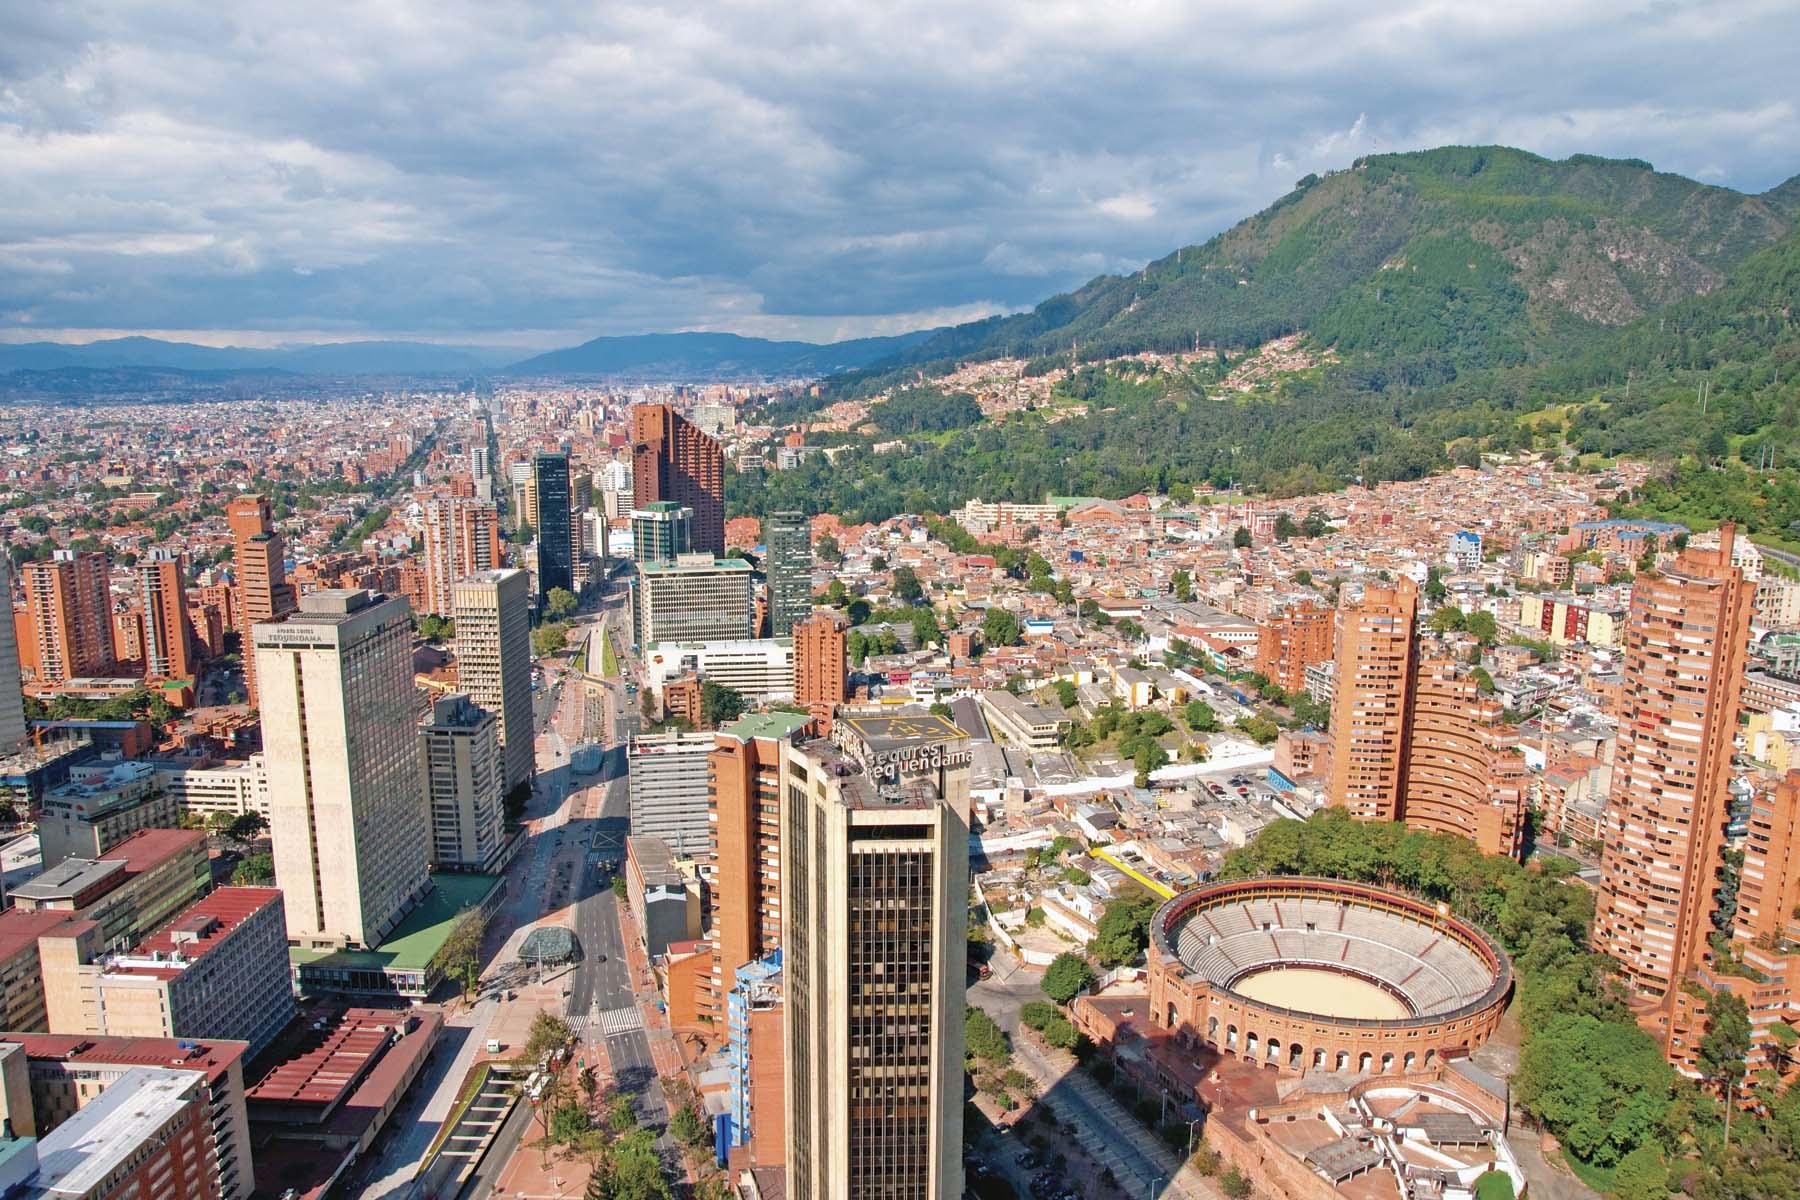 Bogotá, de grandeza gastronómica